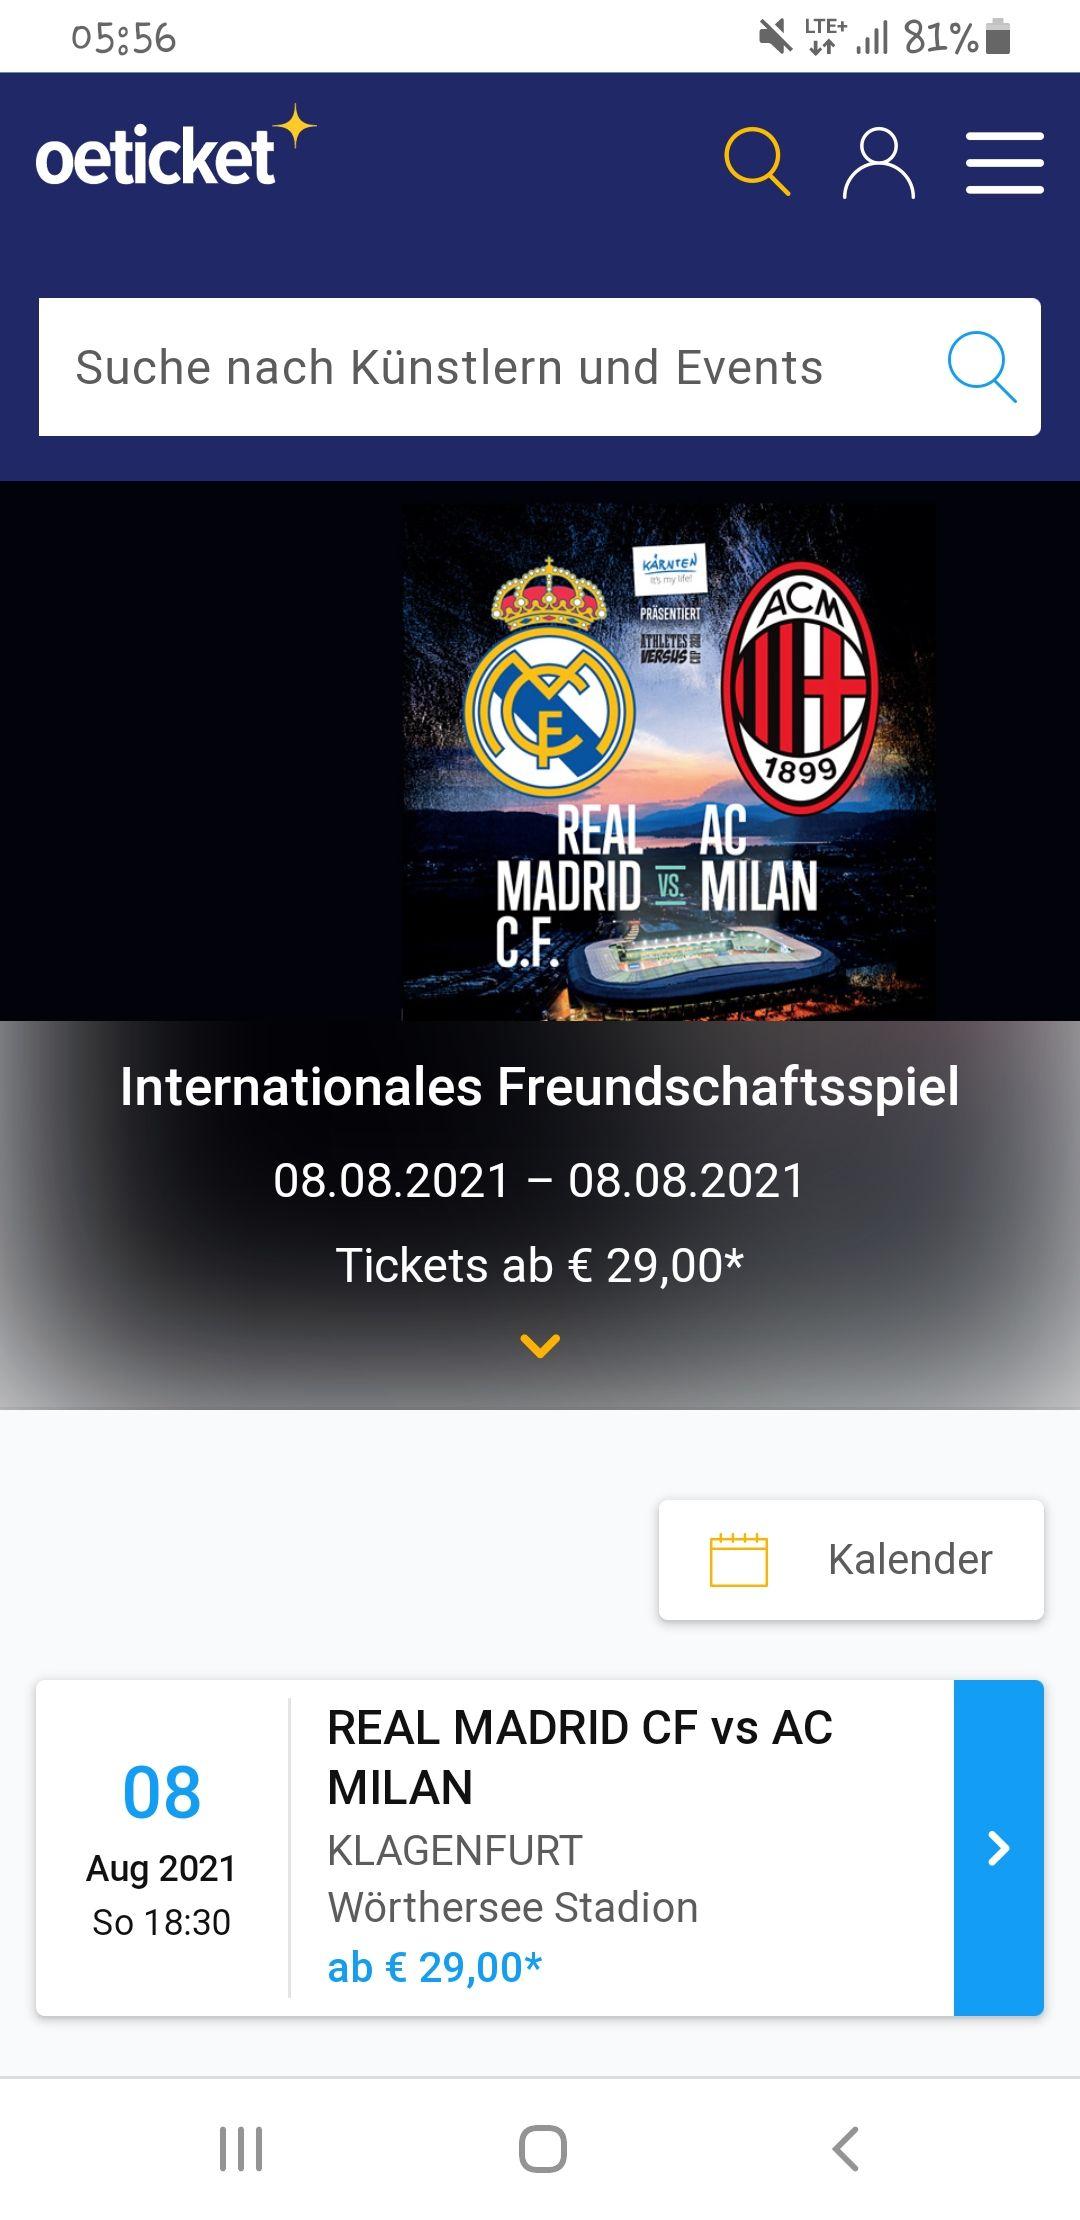 Internationales Freundschaftsspiel: REAL MADRID VS. AC MILAN - Klagenfurt 08.08.2021 – 08.08.2021